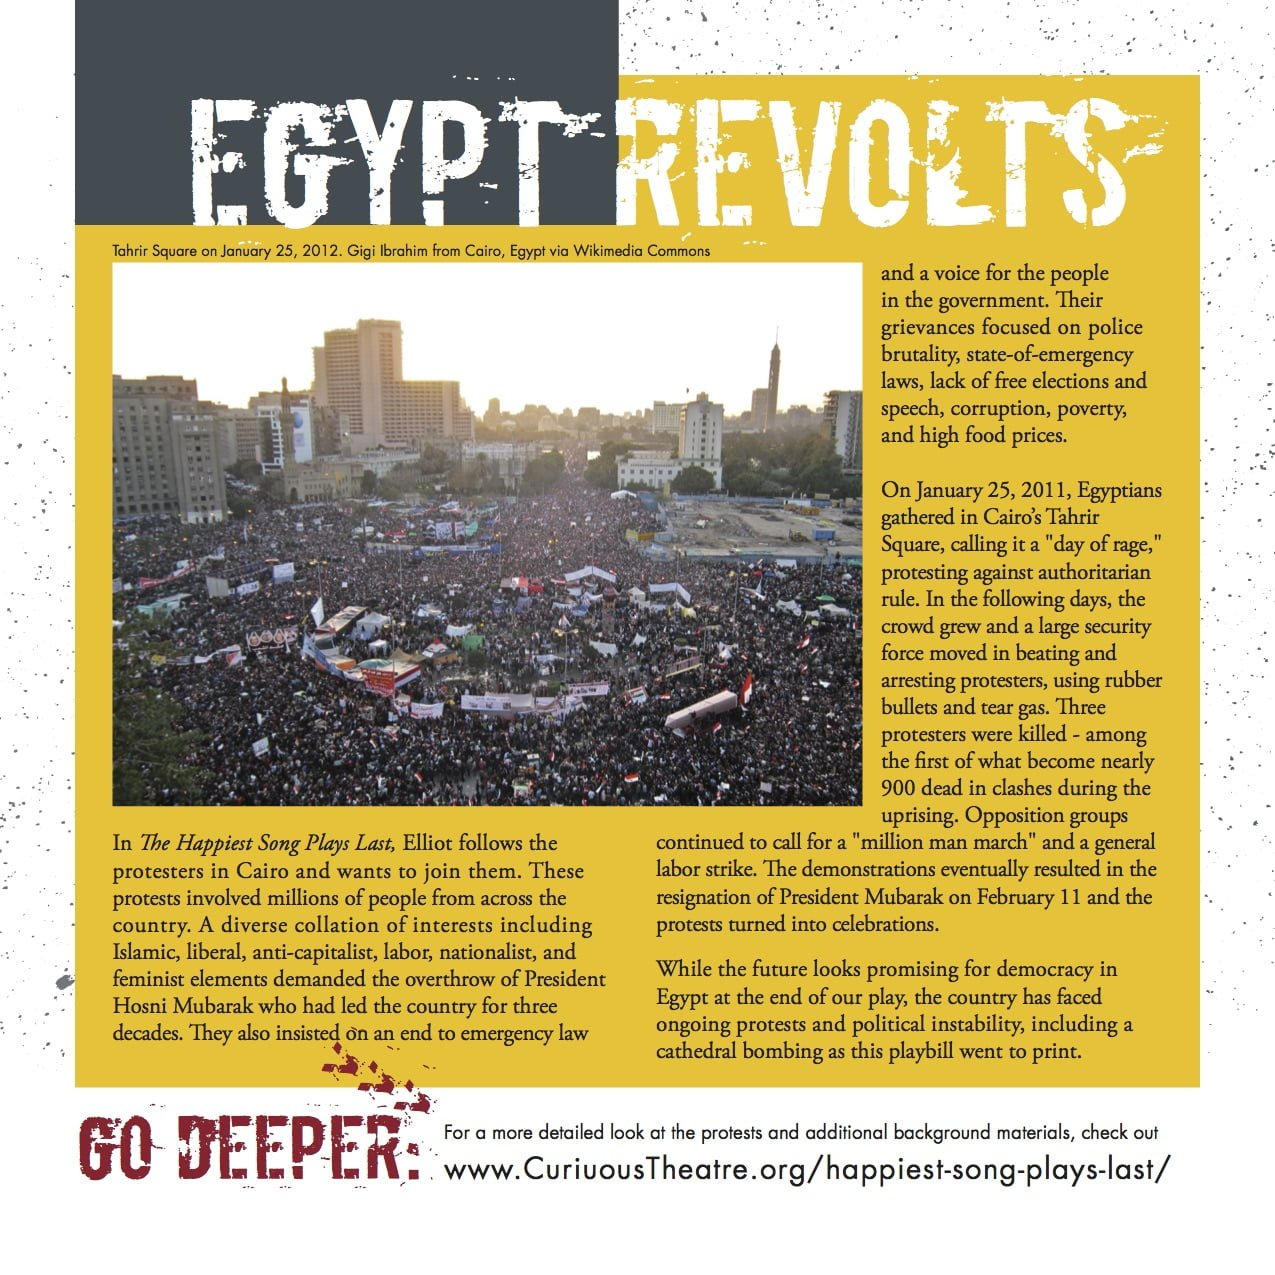 egypt-revolts